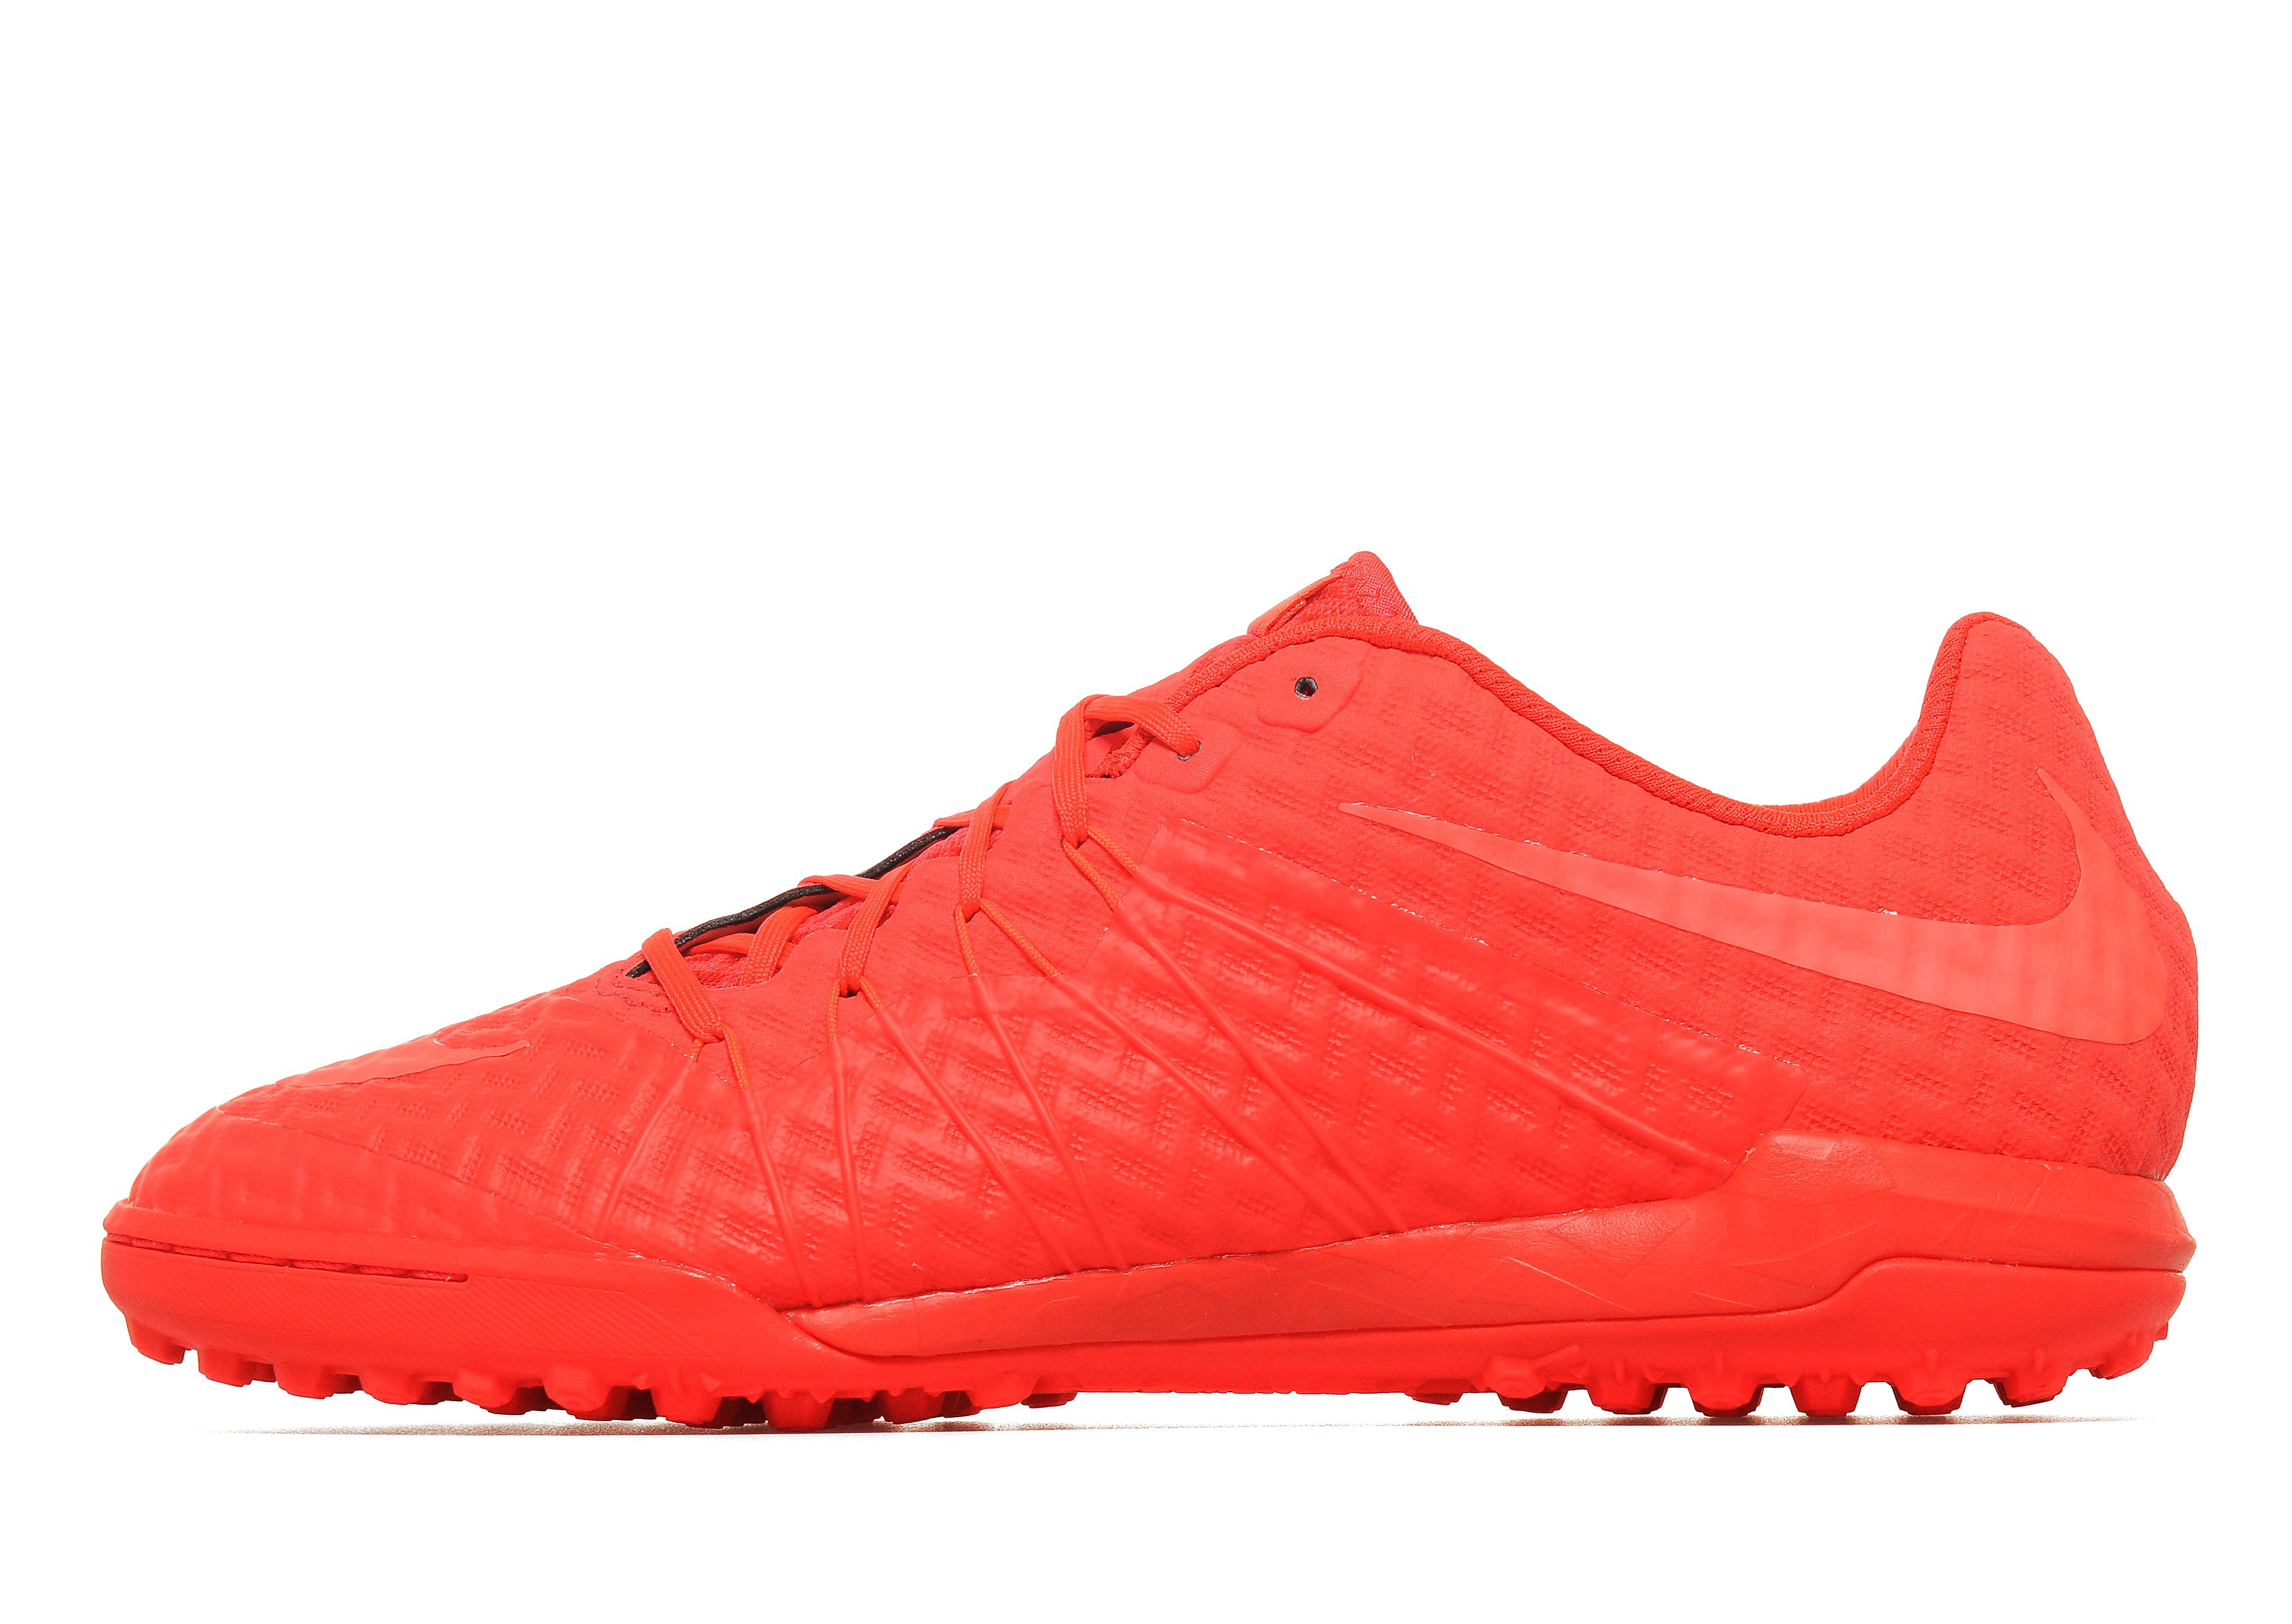 Nike Football X Glow HypervenomX Finale II Turf